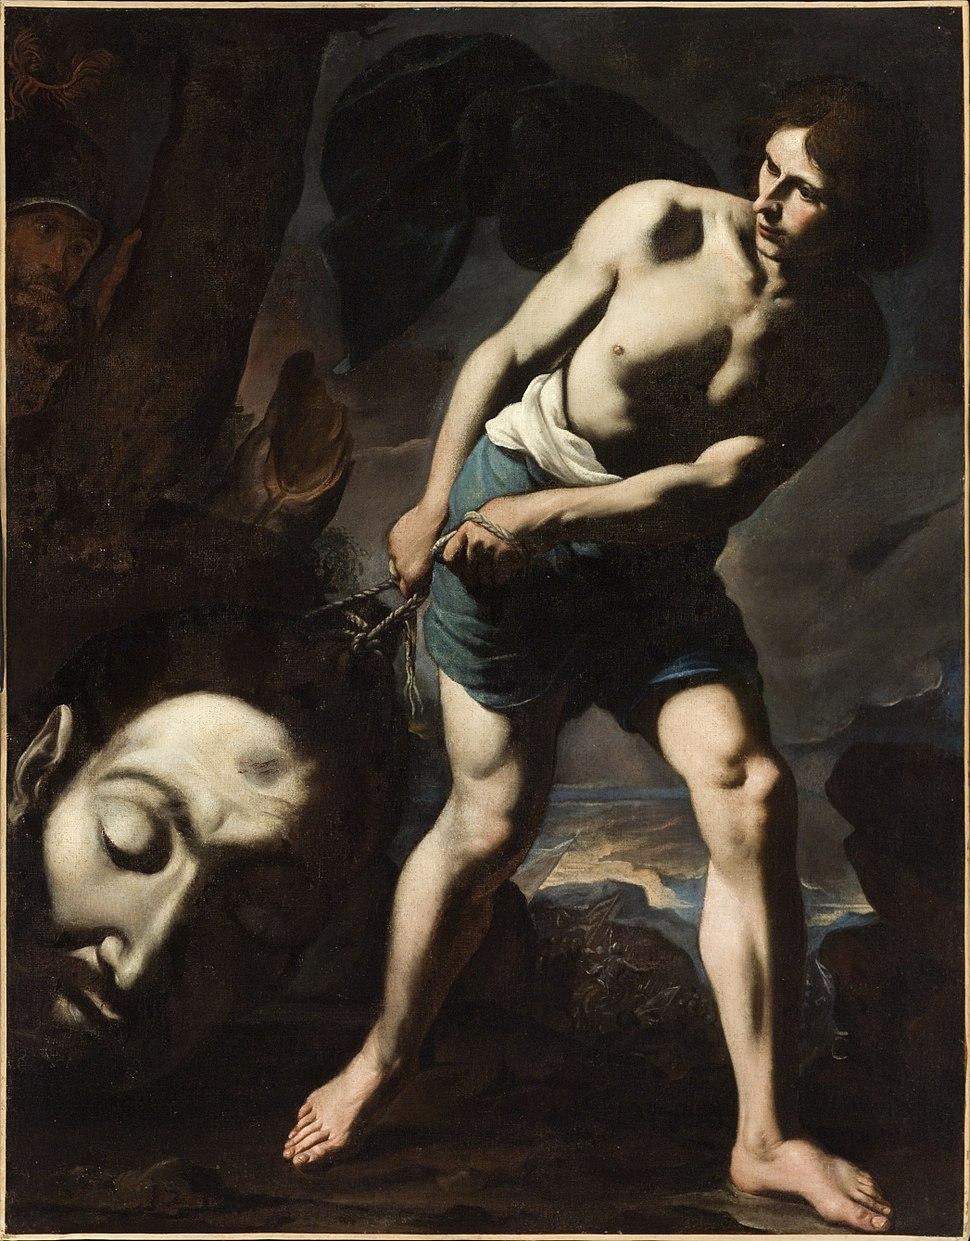 Andrea Vaccaro - David with the Head of Goliath